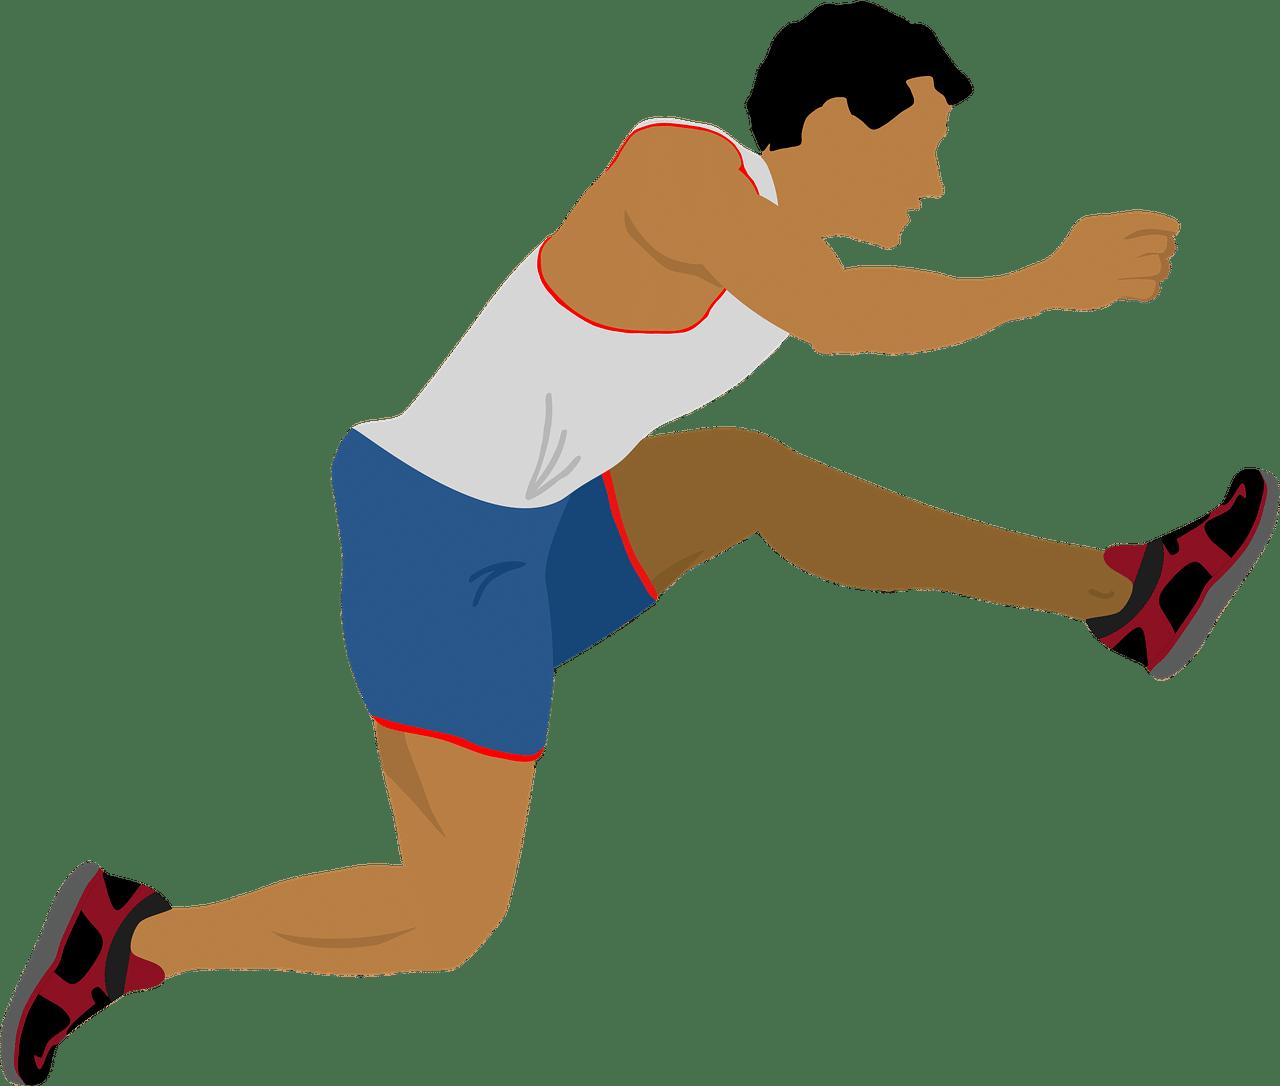 gimnasia artistica masculina y mas